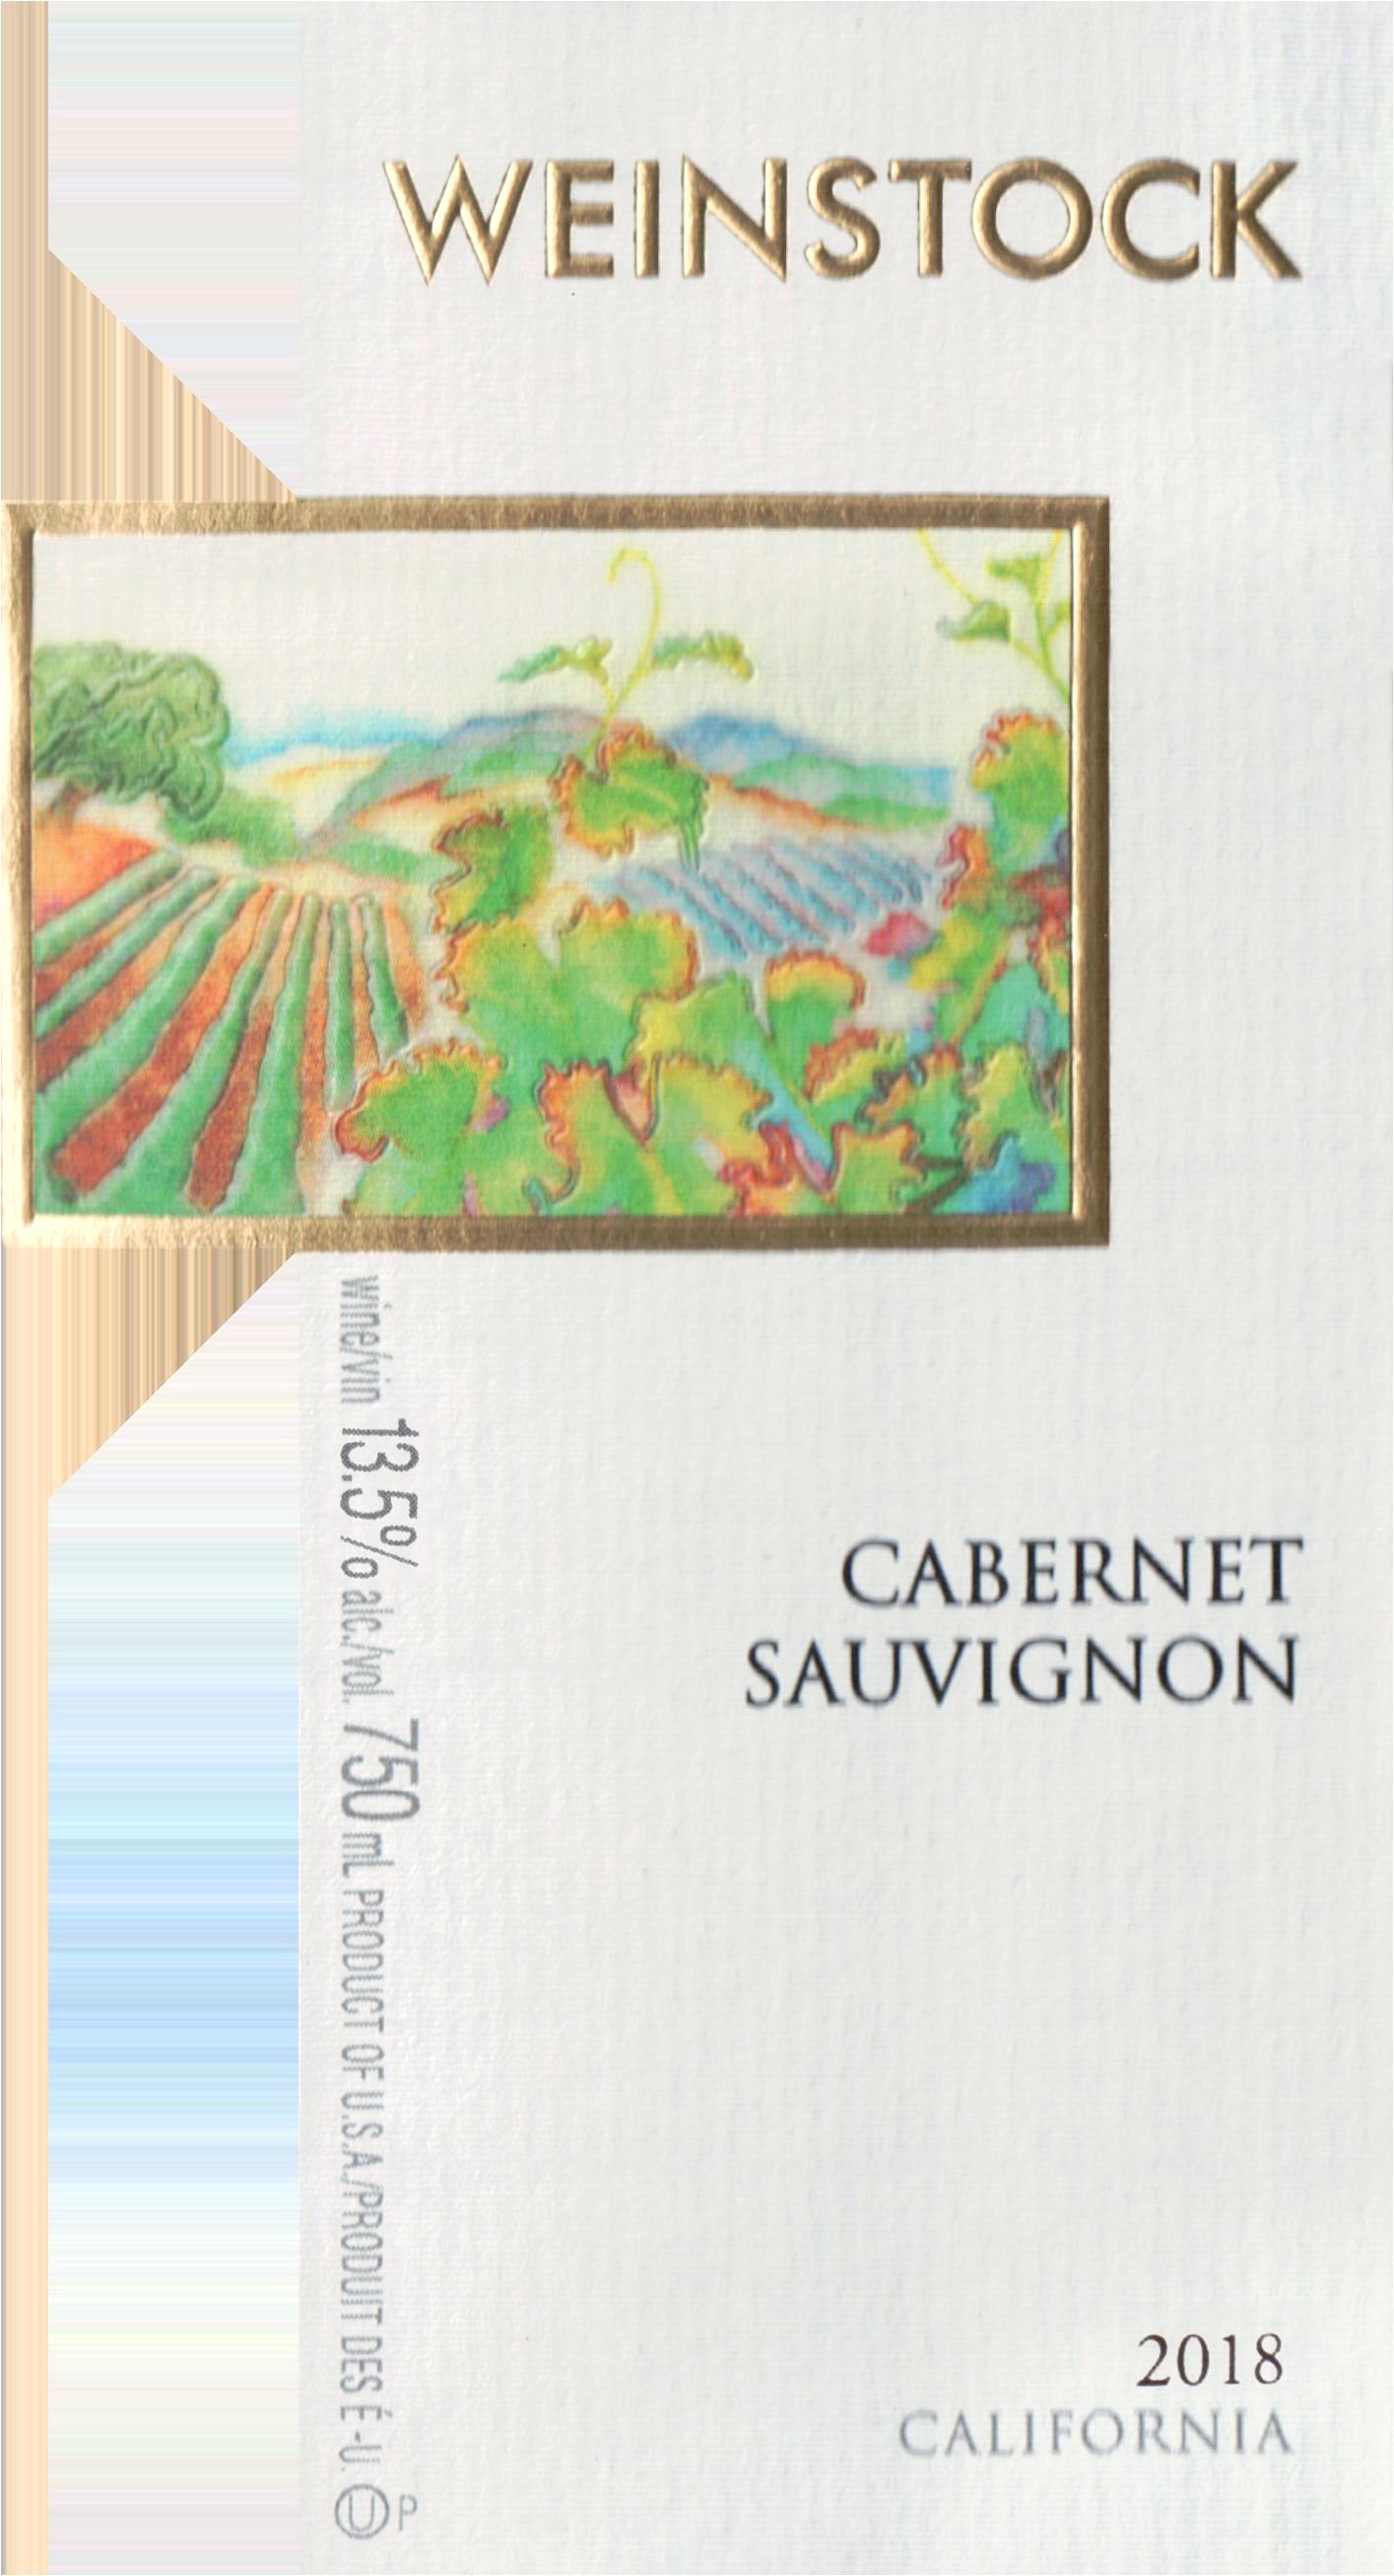 Weinstock Cabernet Sauvignon (U)P 2018